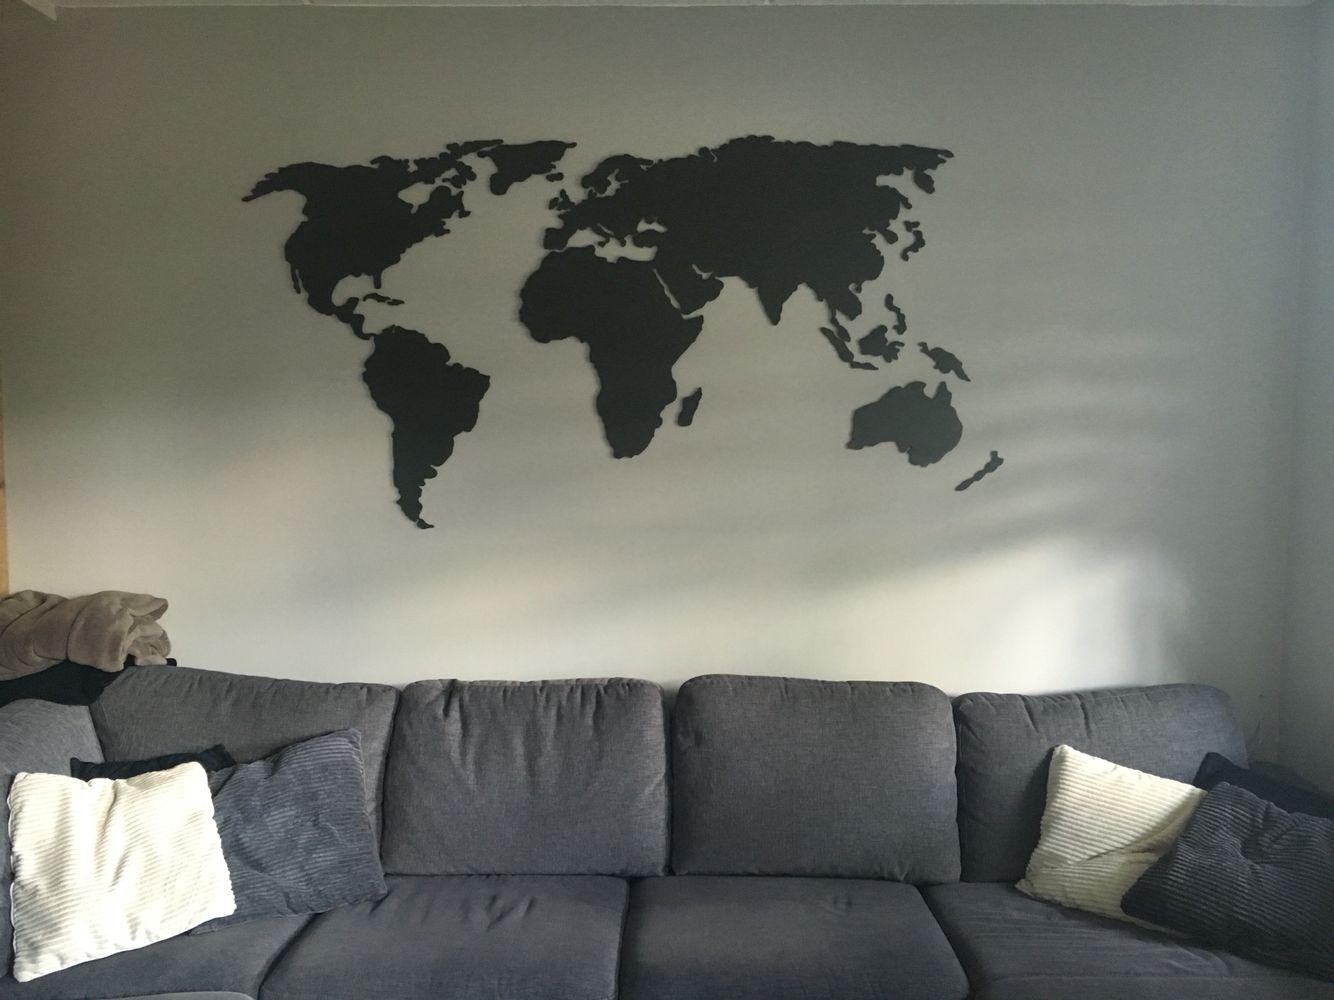 Woonkamer Met Wereldkaart : Stalen wereldkaart in de woonkamer 😍 woonkamer wereldkaart en